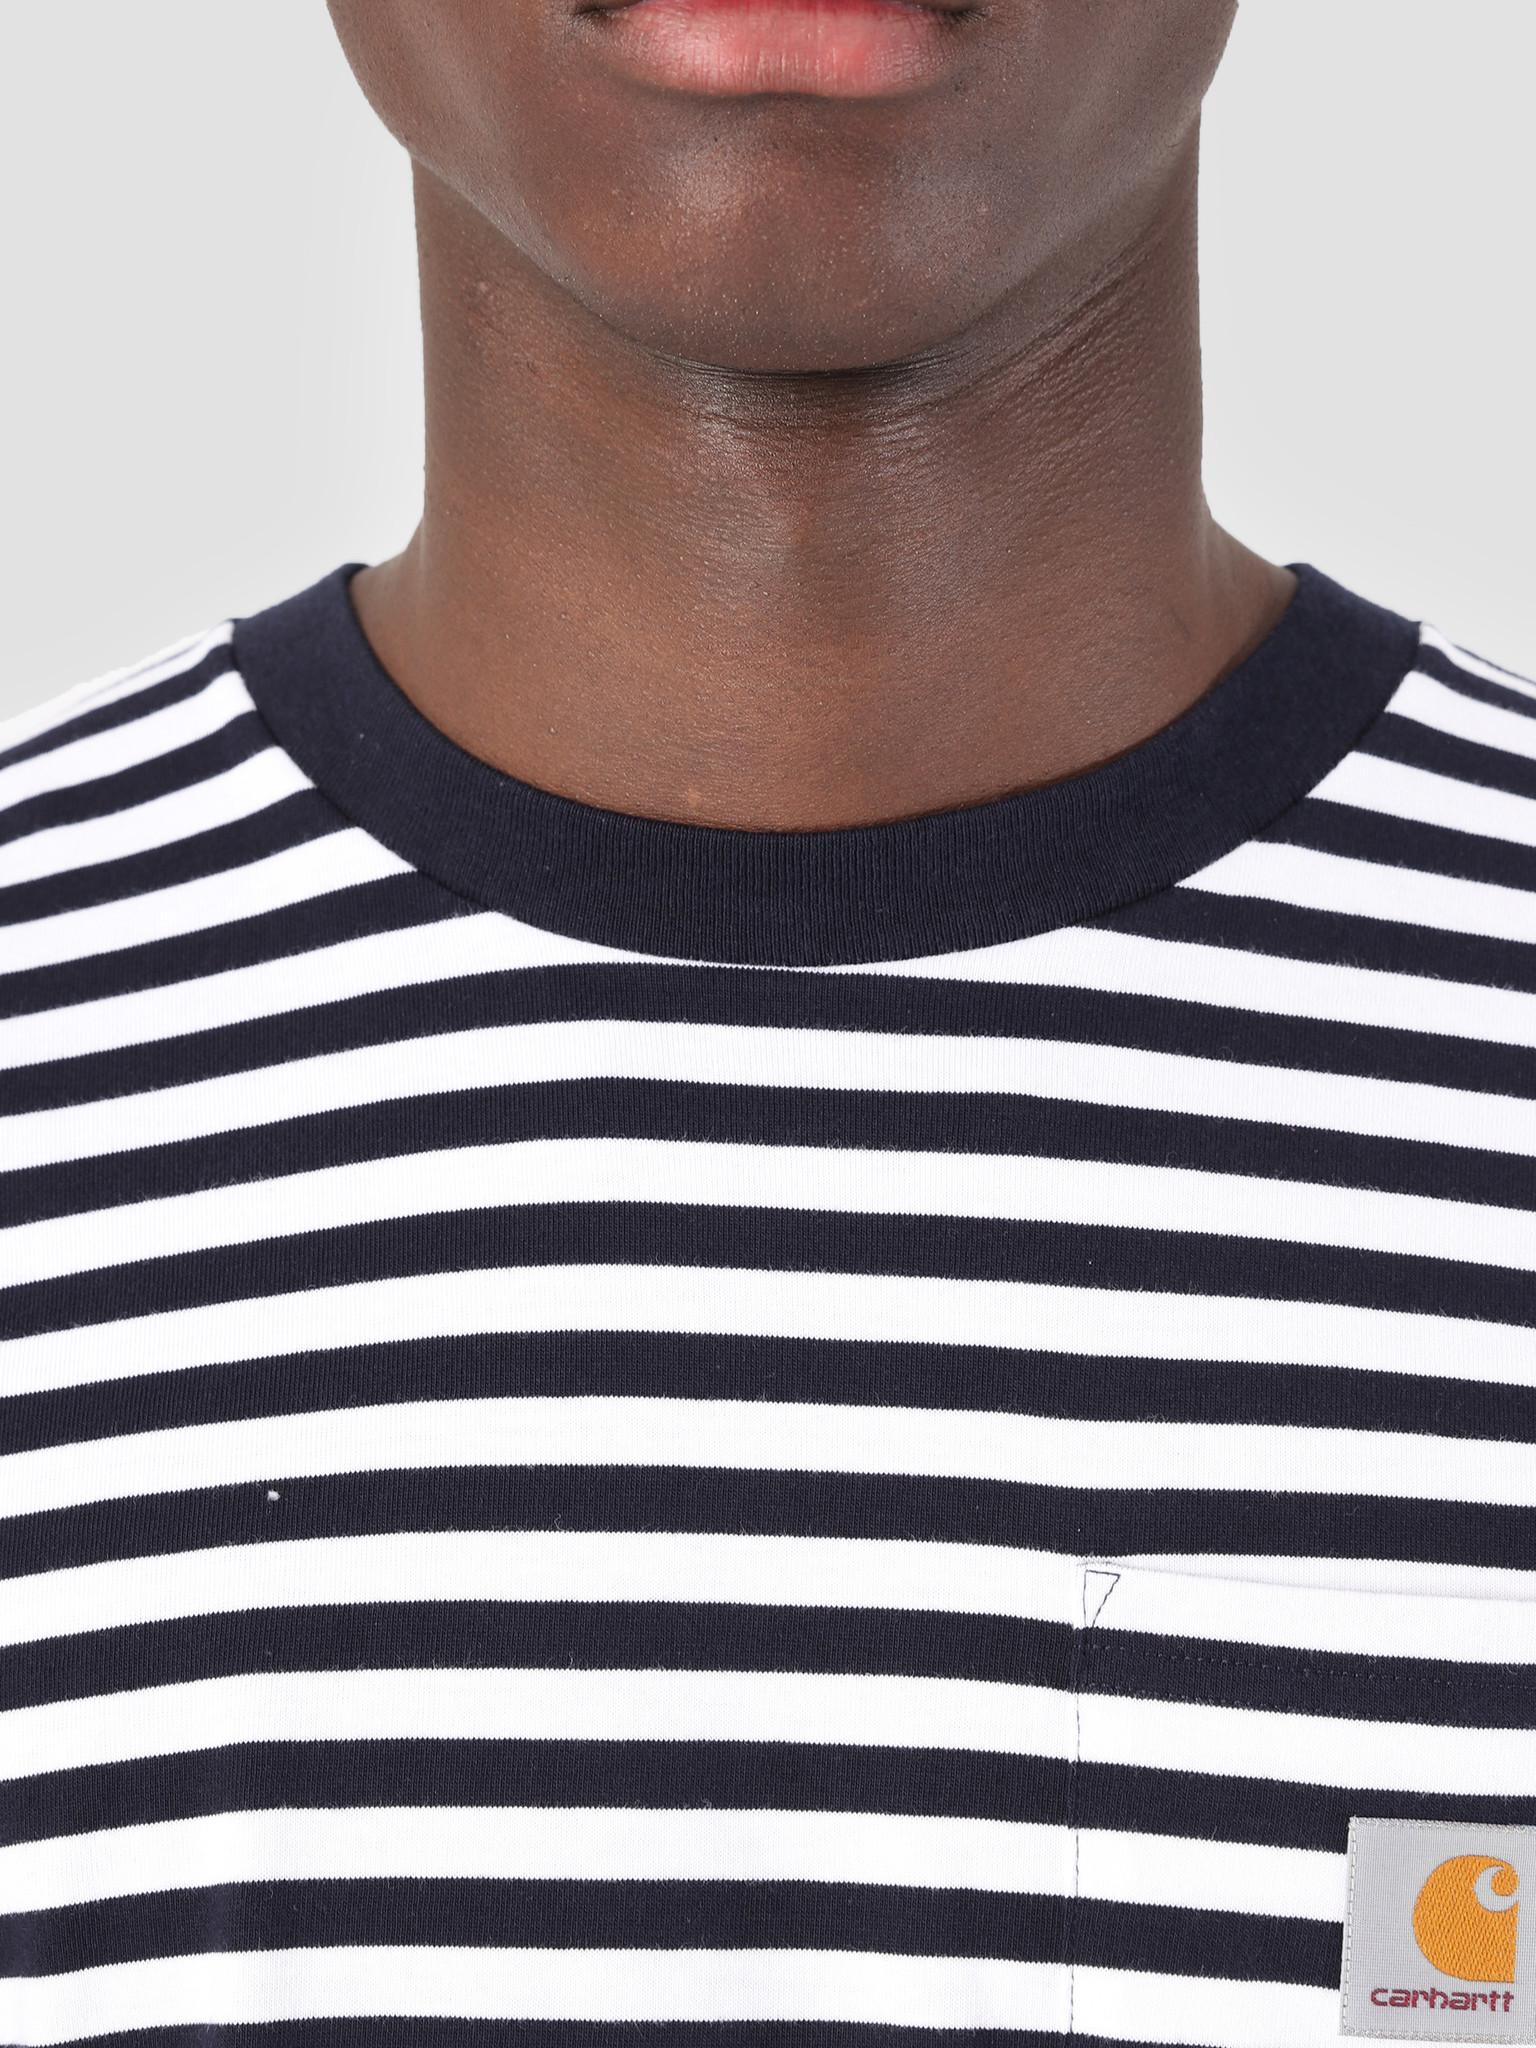 Carhartt WIP Carhartt WIP Longsleeve Barkley Pocket T-Shirt Stripe Barkley Stripe, Dark Navy White I026365